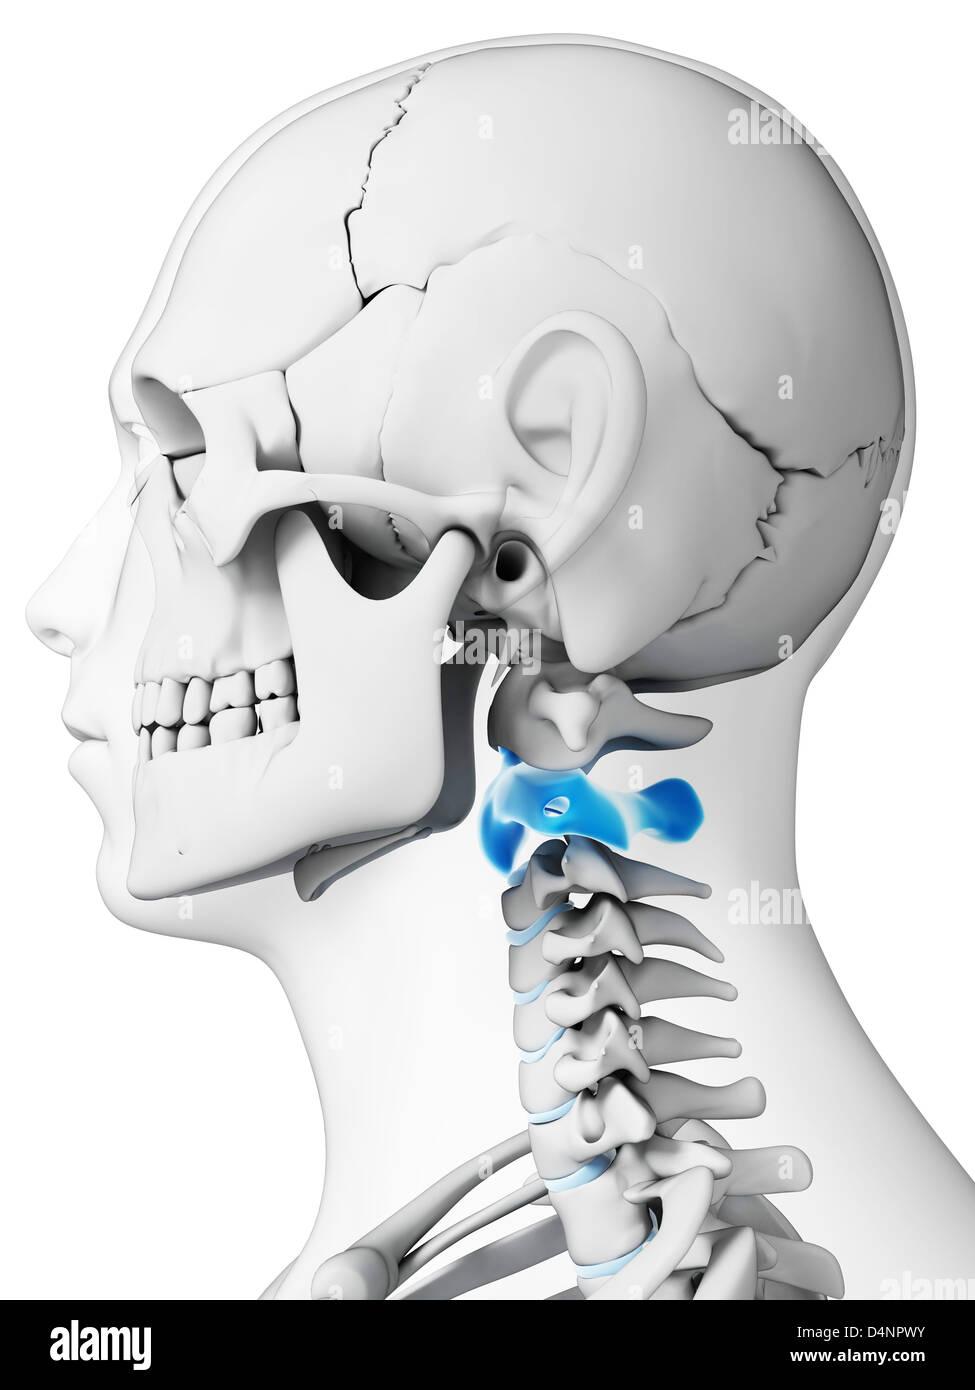 Axis Bone Stockfotos & Axis Bone Bilder - Seite 2 - Alamy